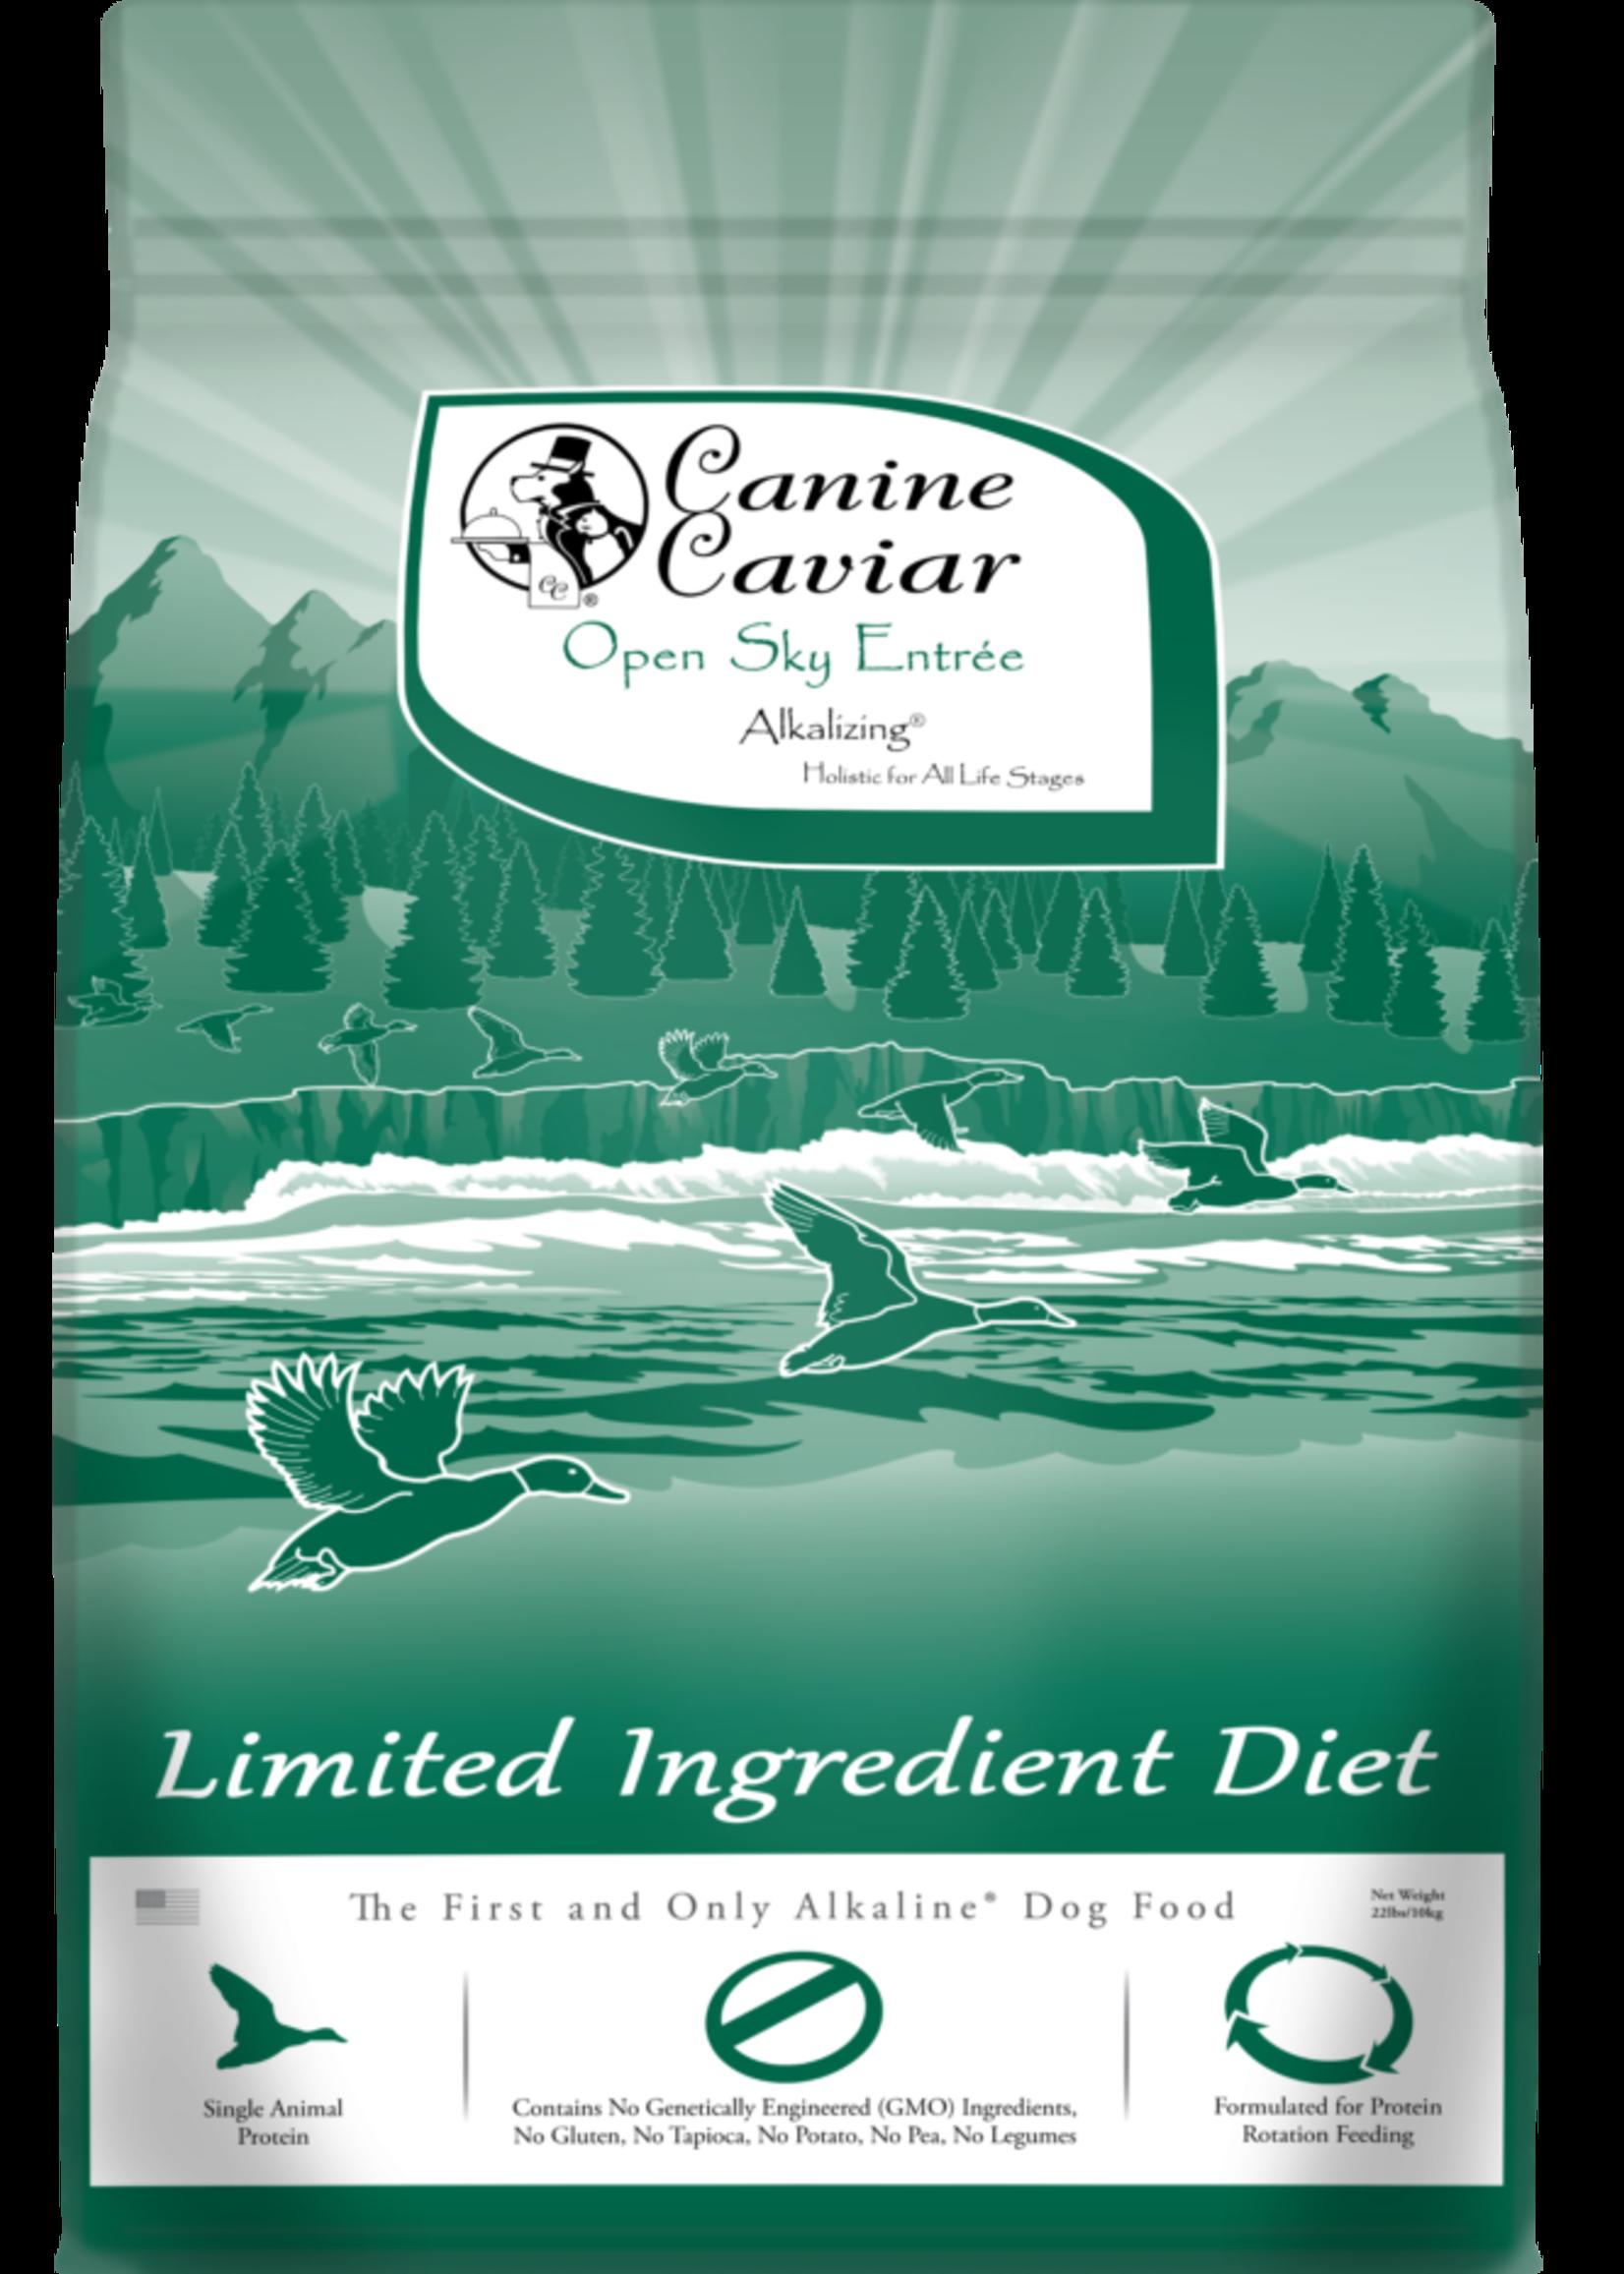 Canine Caviar Canine Caviar Open Sky L.I.D. Alkaline Holistic Entree 11lbs